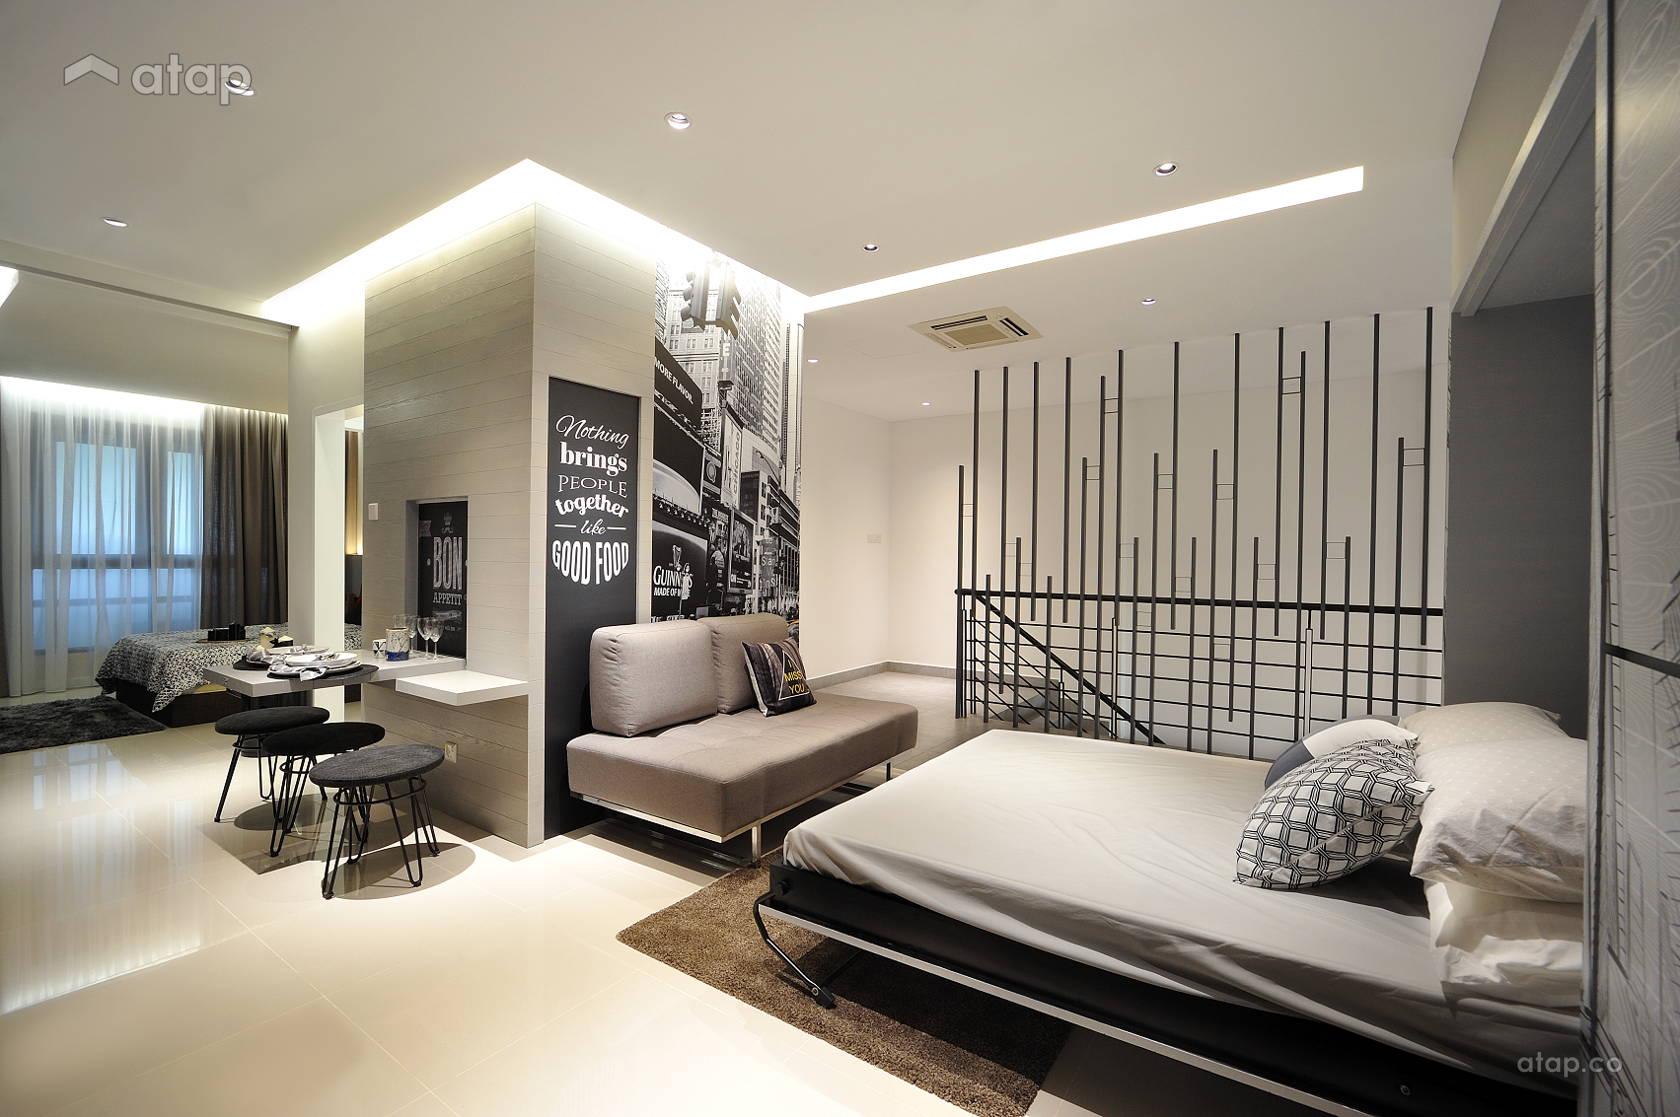 1 / 8 & HighPark Studio A1 interior design renovation ideas photos and ...